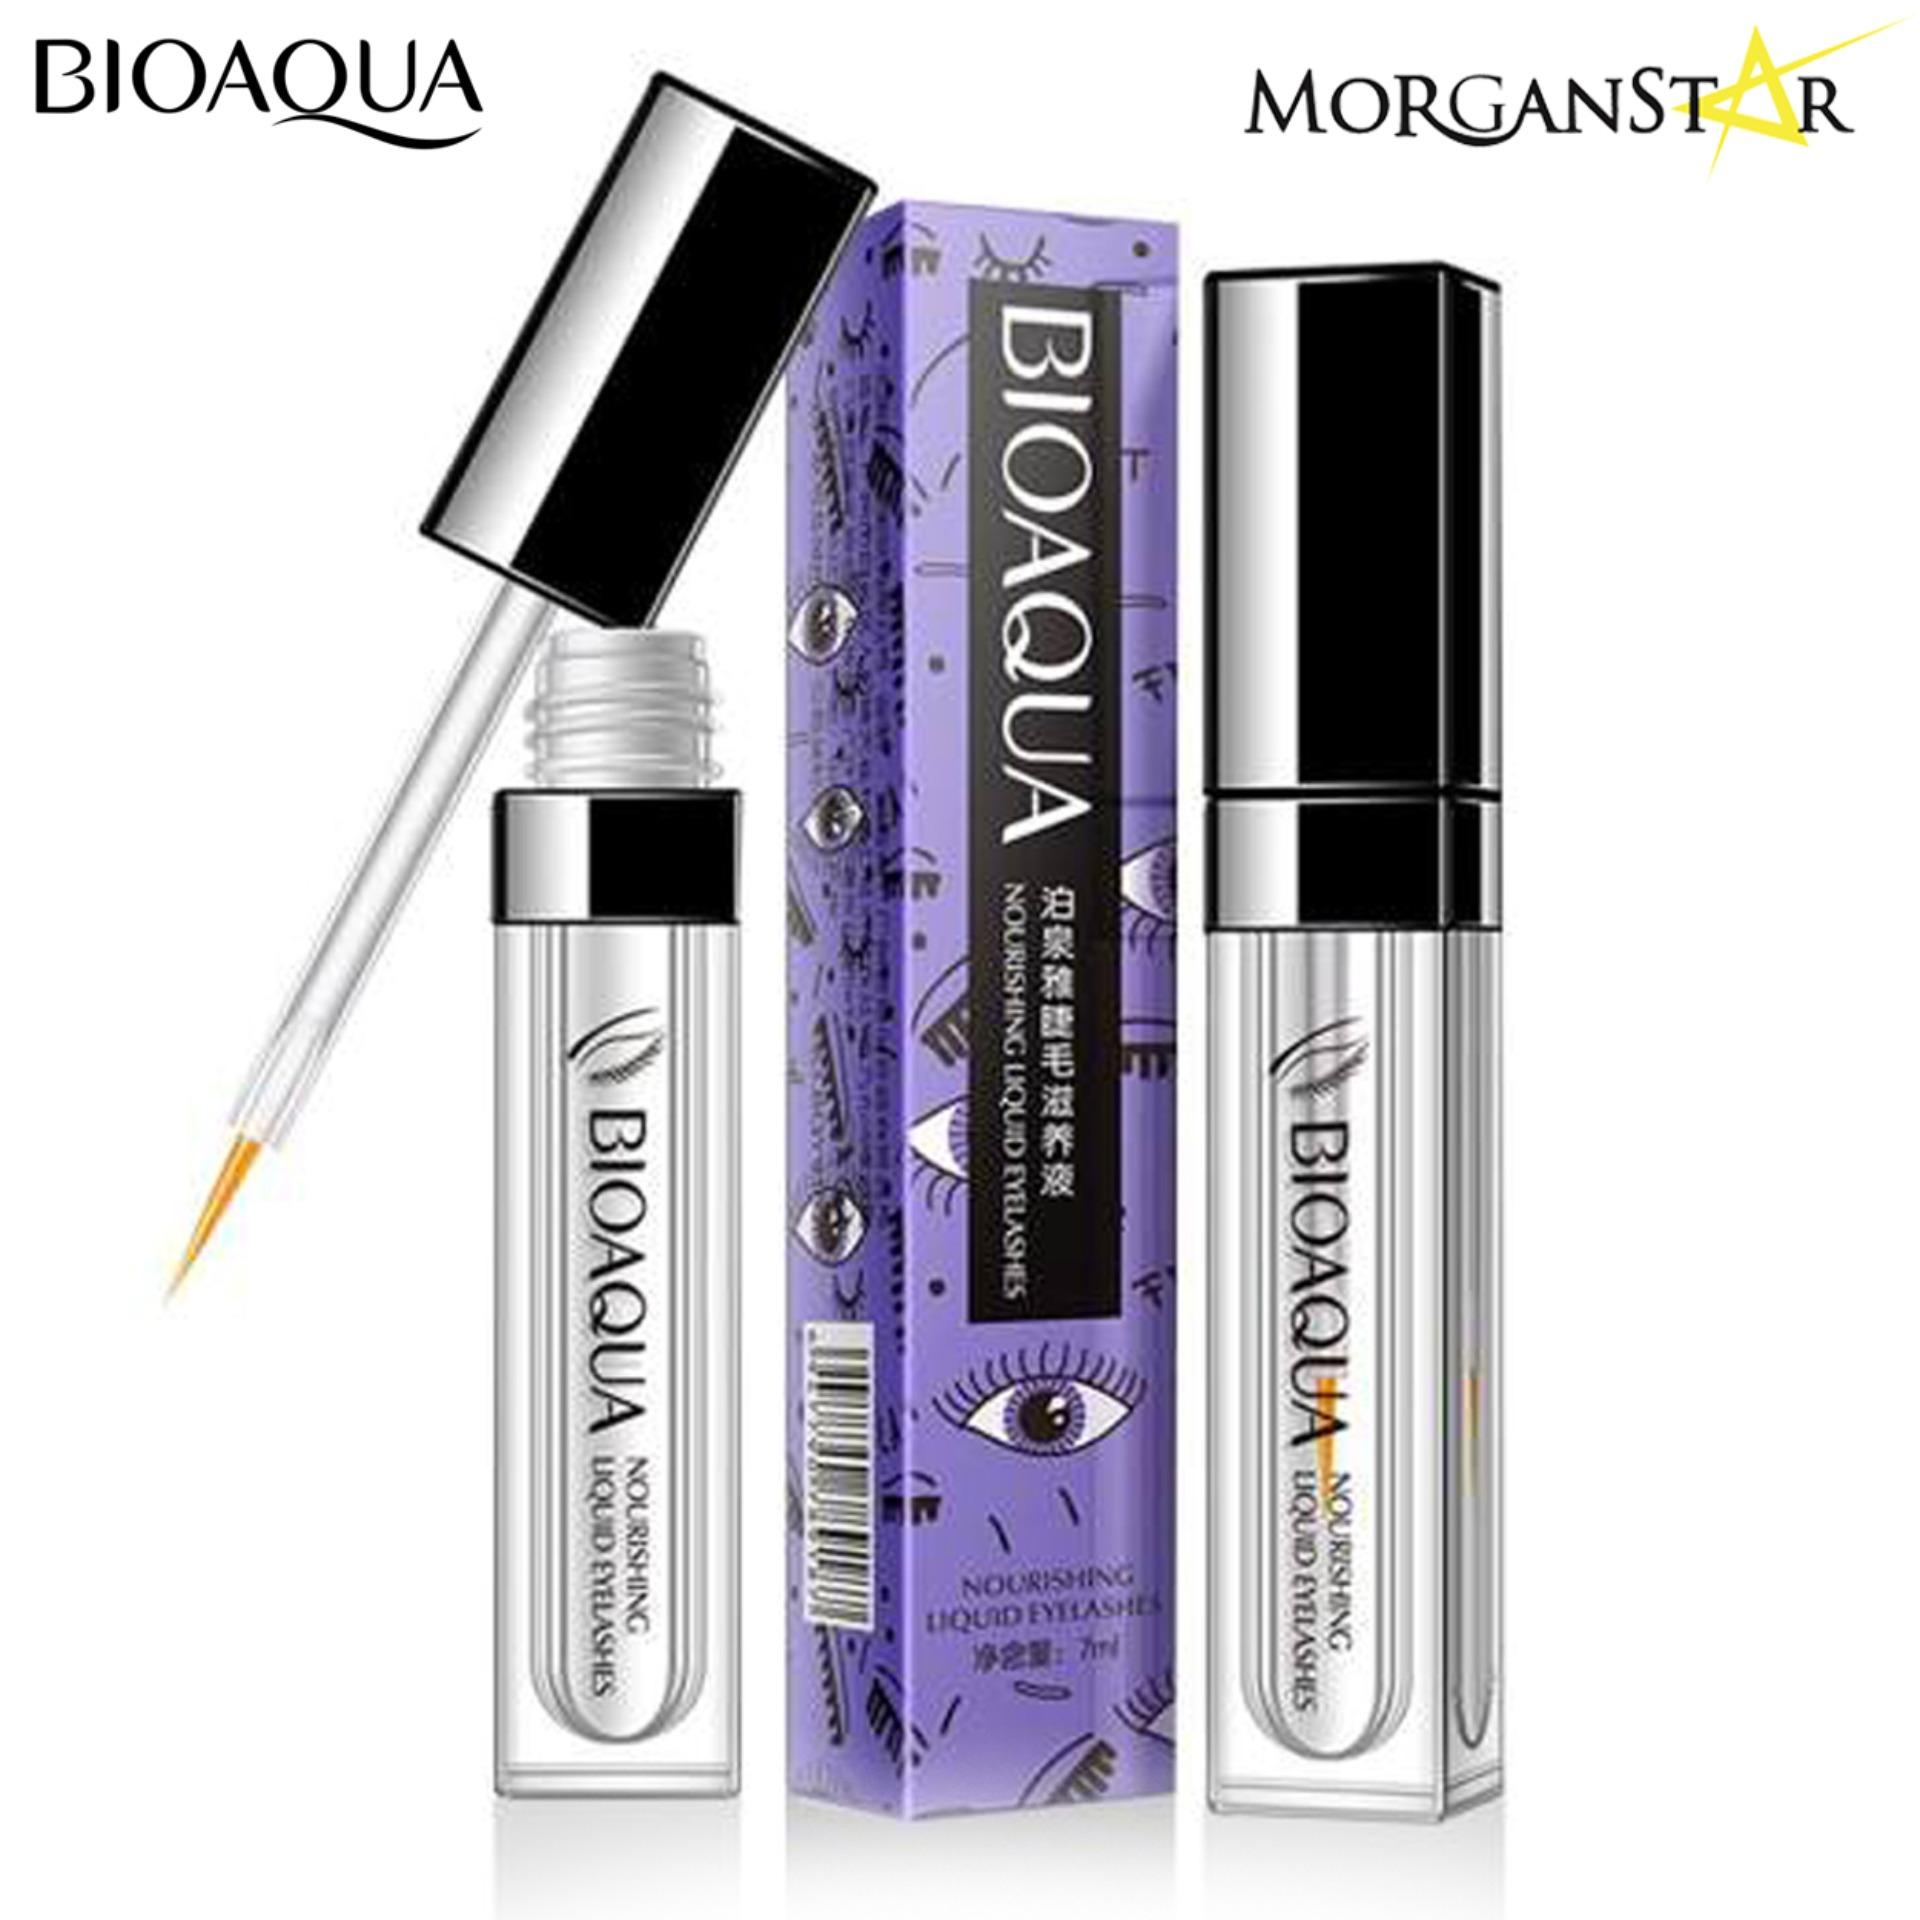 Bioaqua Philippines Price List Anti Aging Acne Activated Carbon Black Mask Charcoal Nourishing Eyelash Grower 7ml